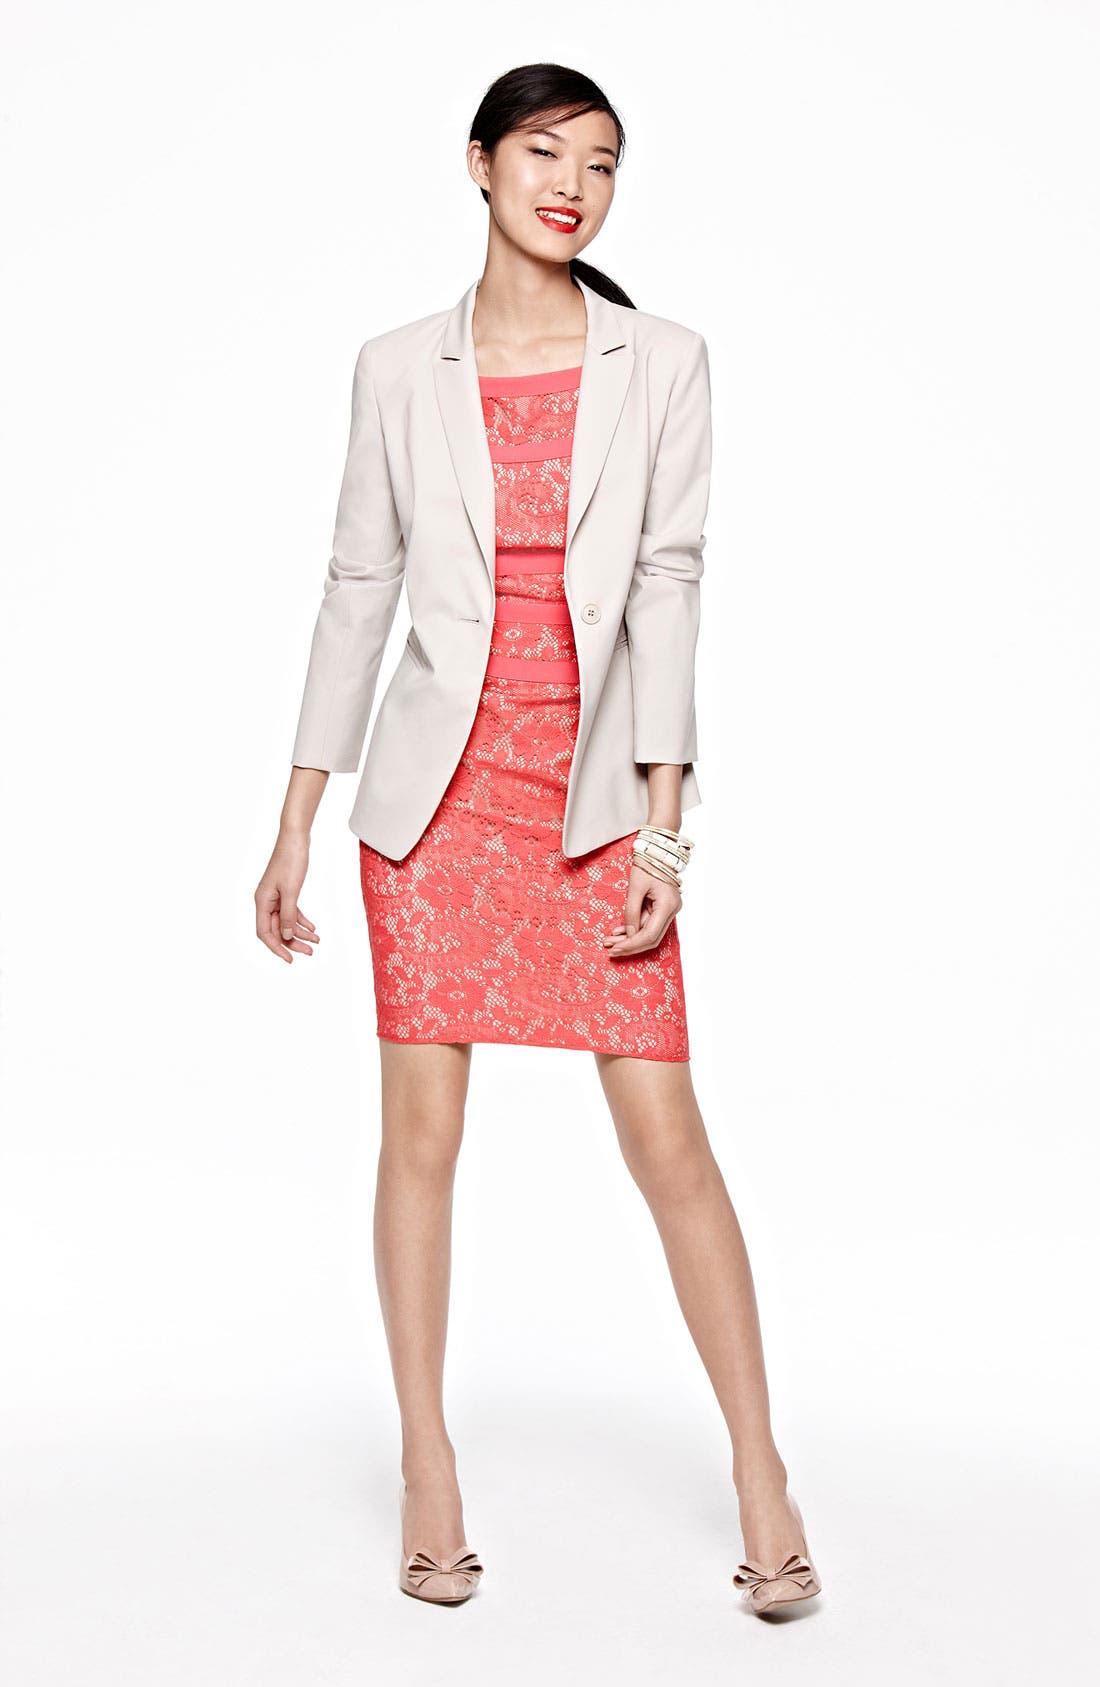 Main Image - Chaus Blazer, Adrianna Papell Dress & Accessories